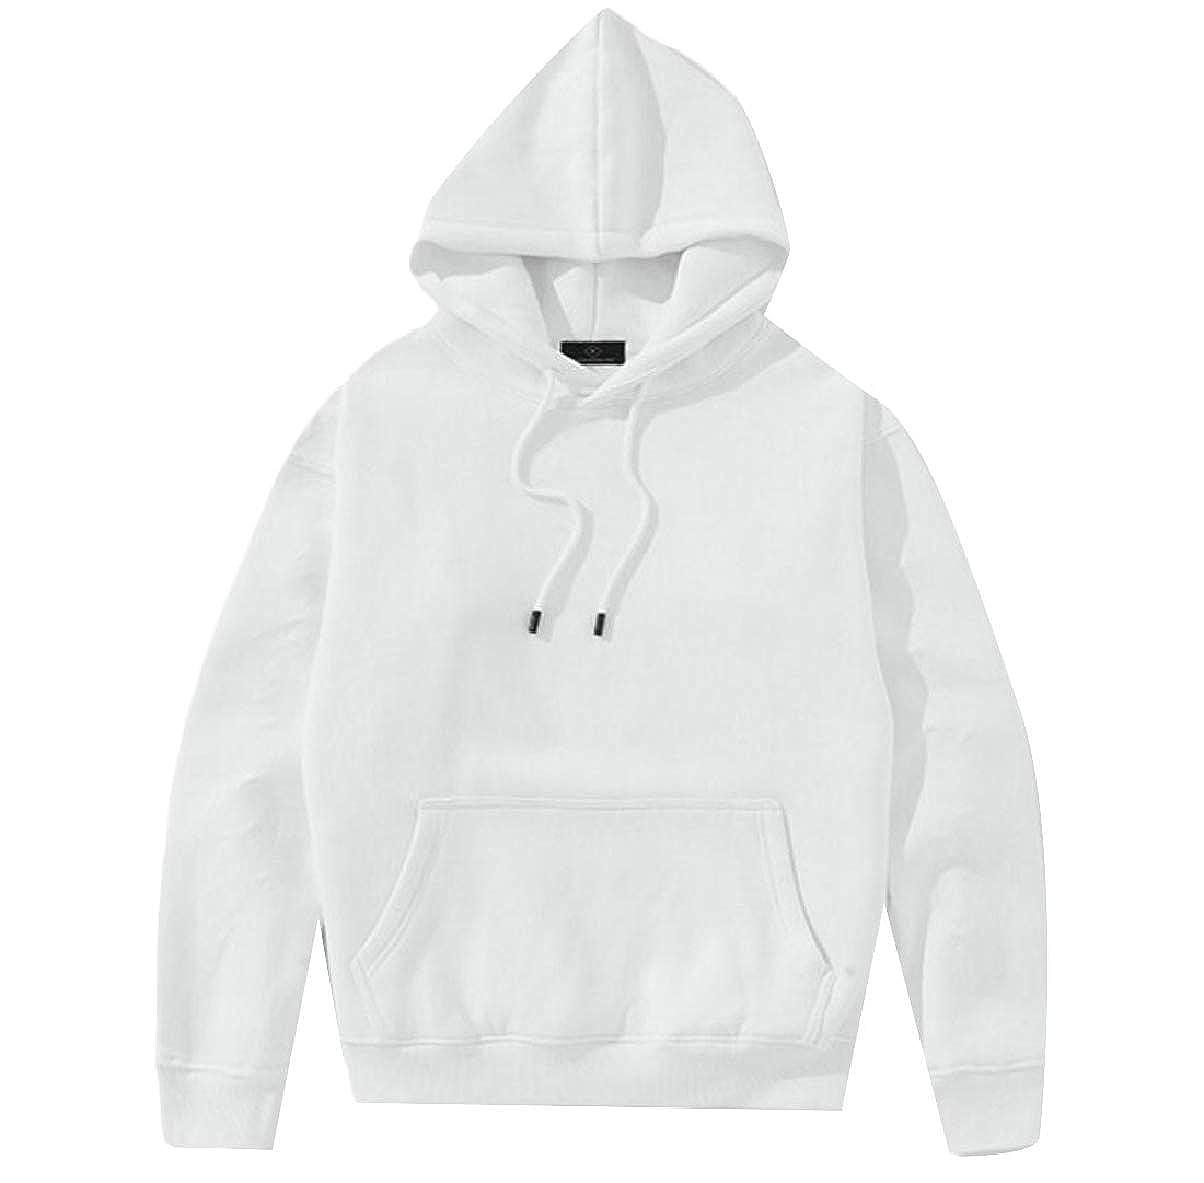 ZXFHZS Mens Solid Color Casual Thicken Warm Hoodie Sports Sweatshirt Pullover